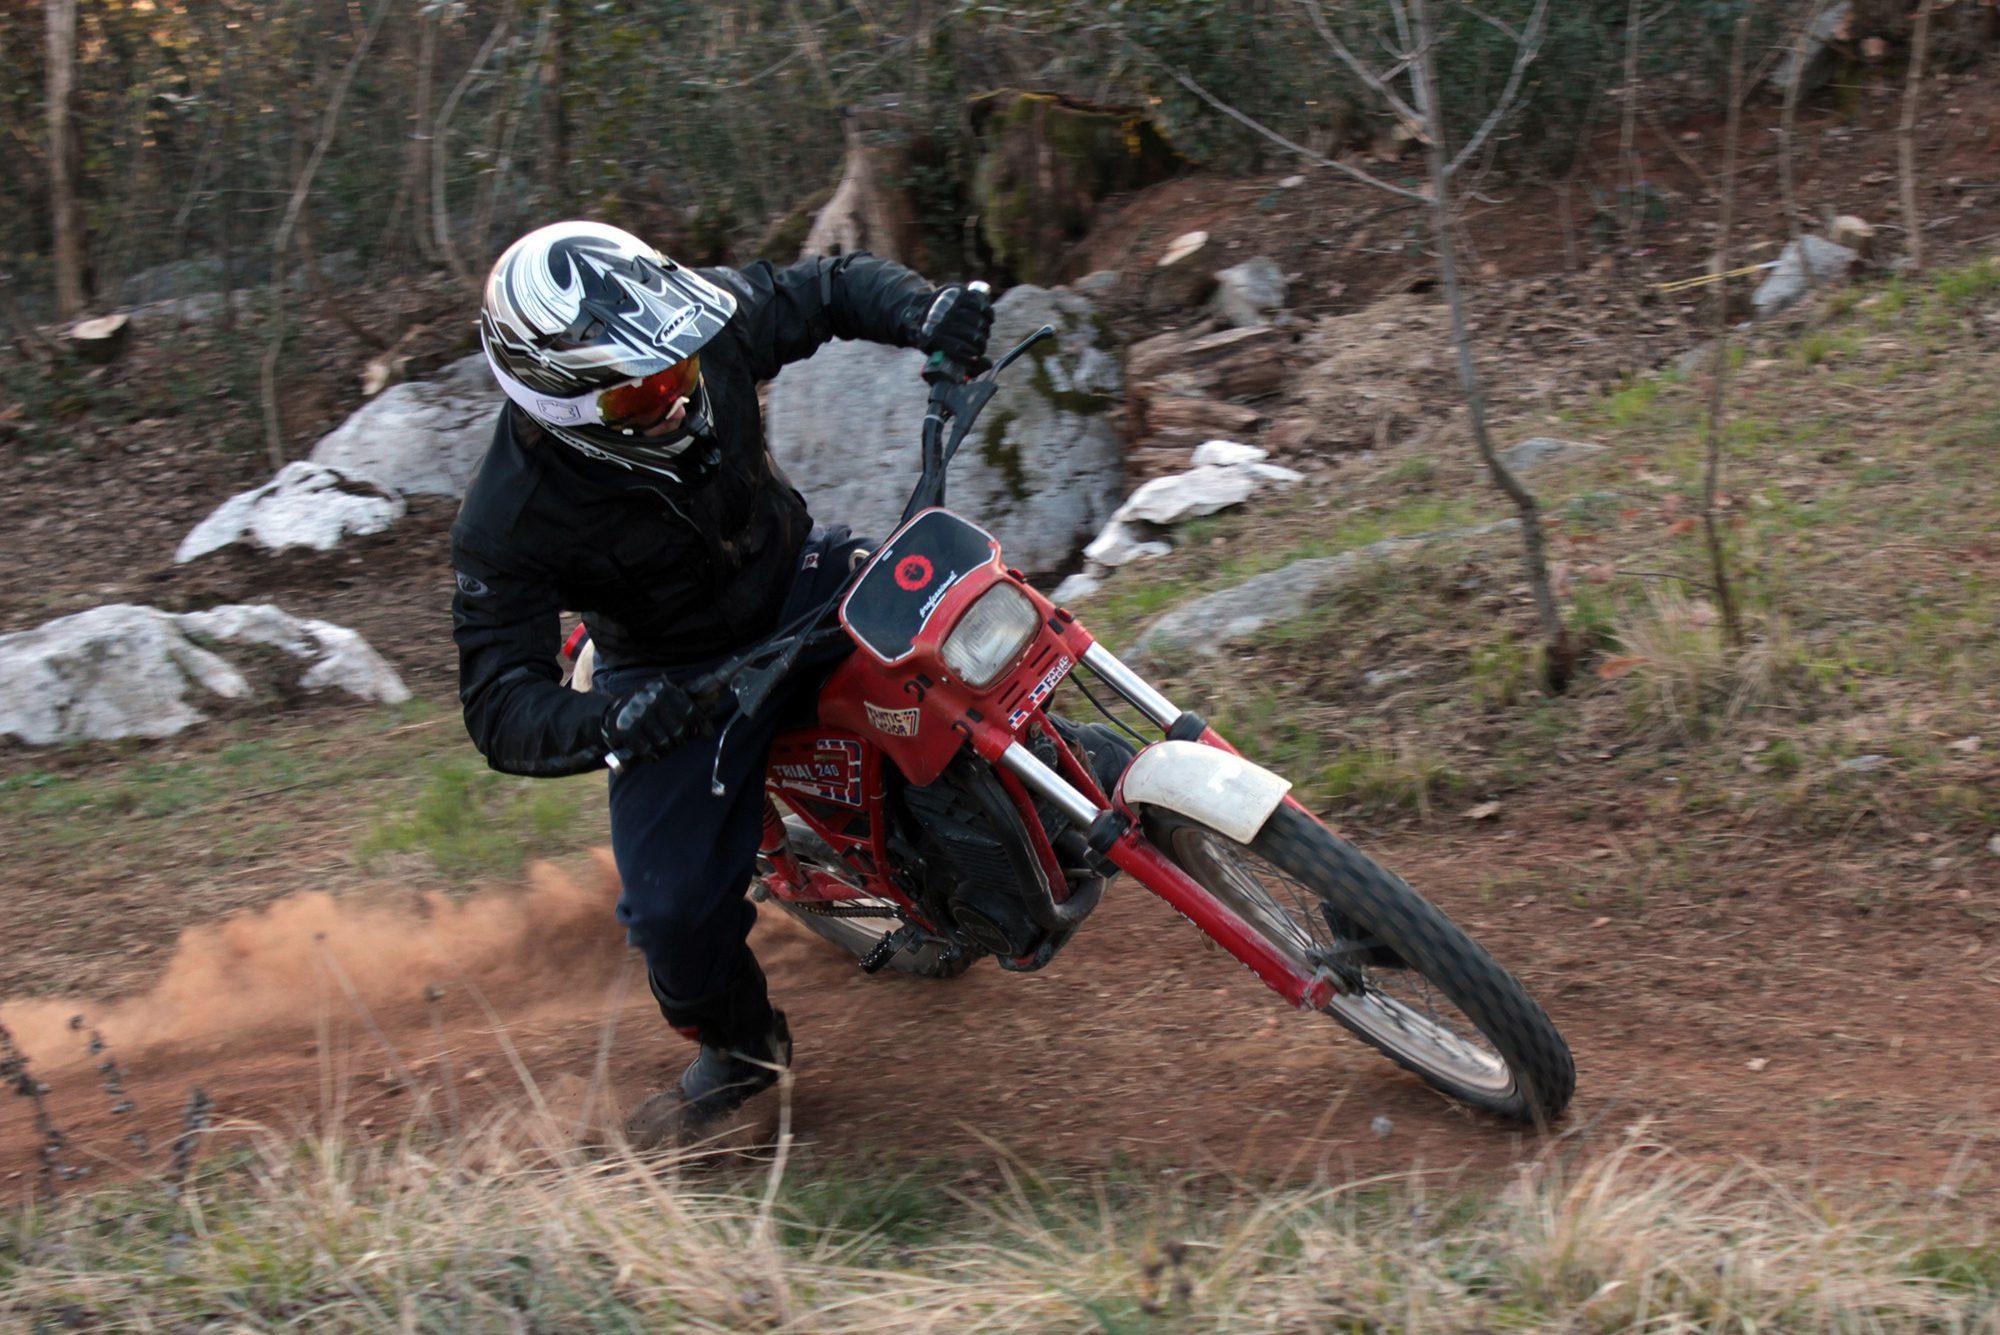 Franzoni Motori Off-Road e Motocross